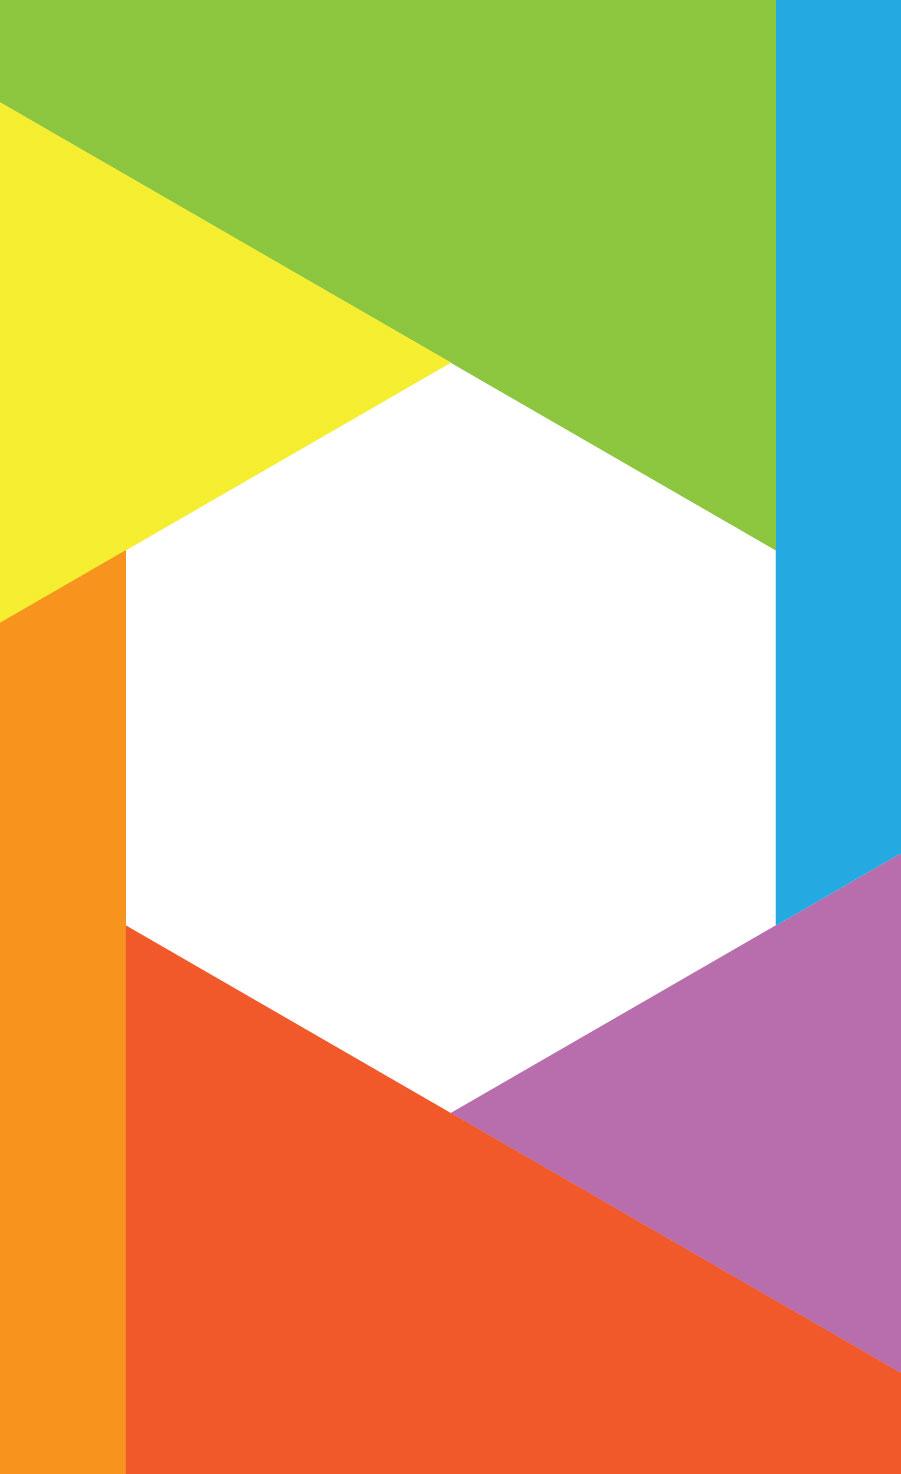 hexagonal id card